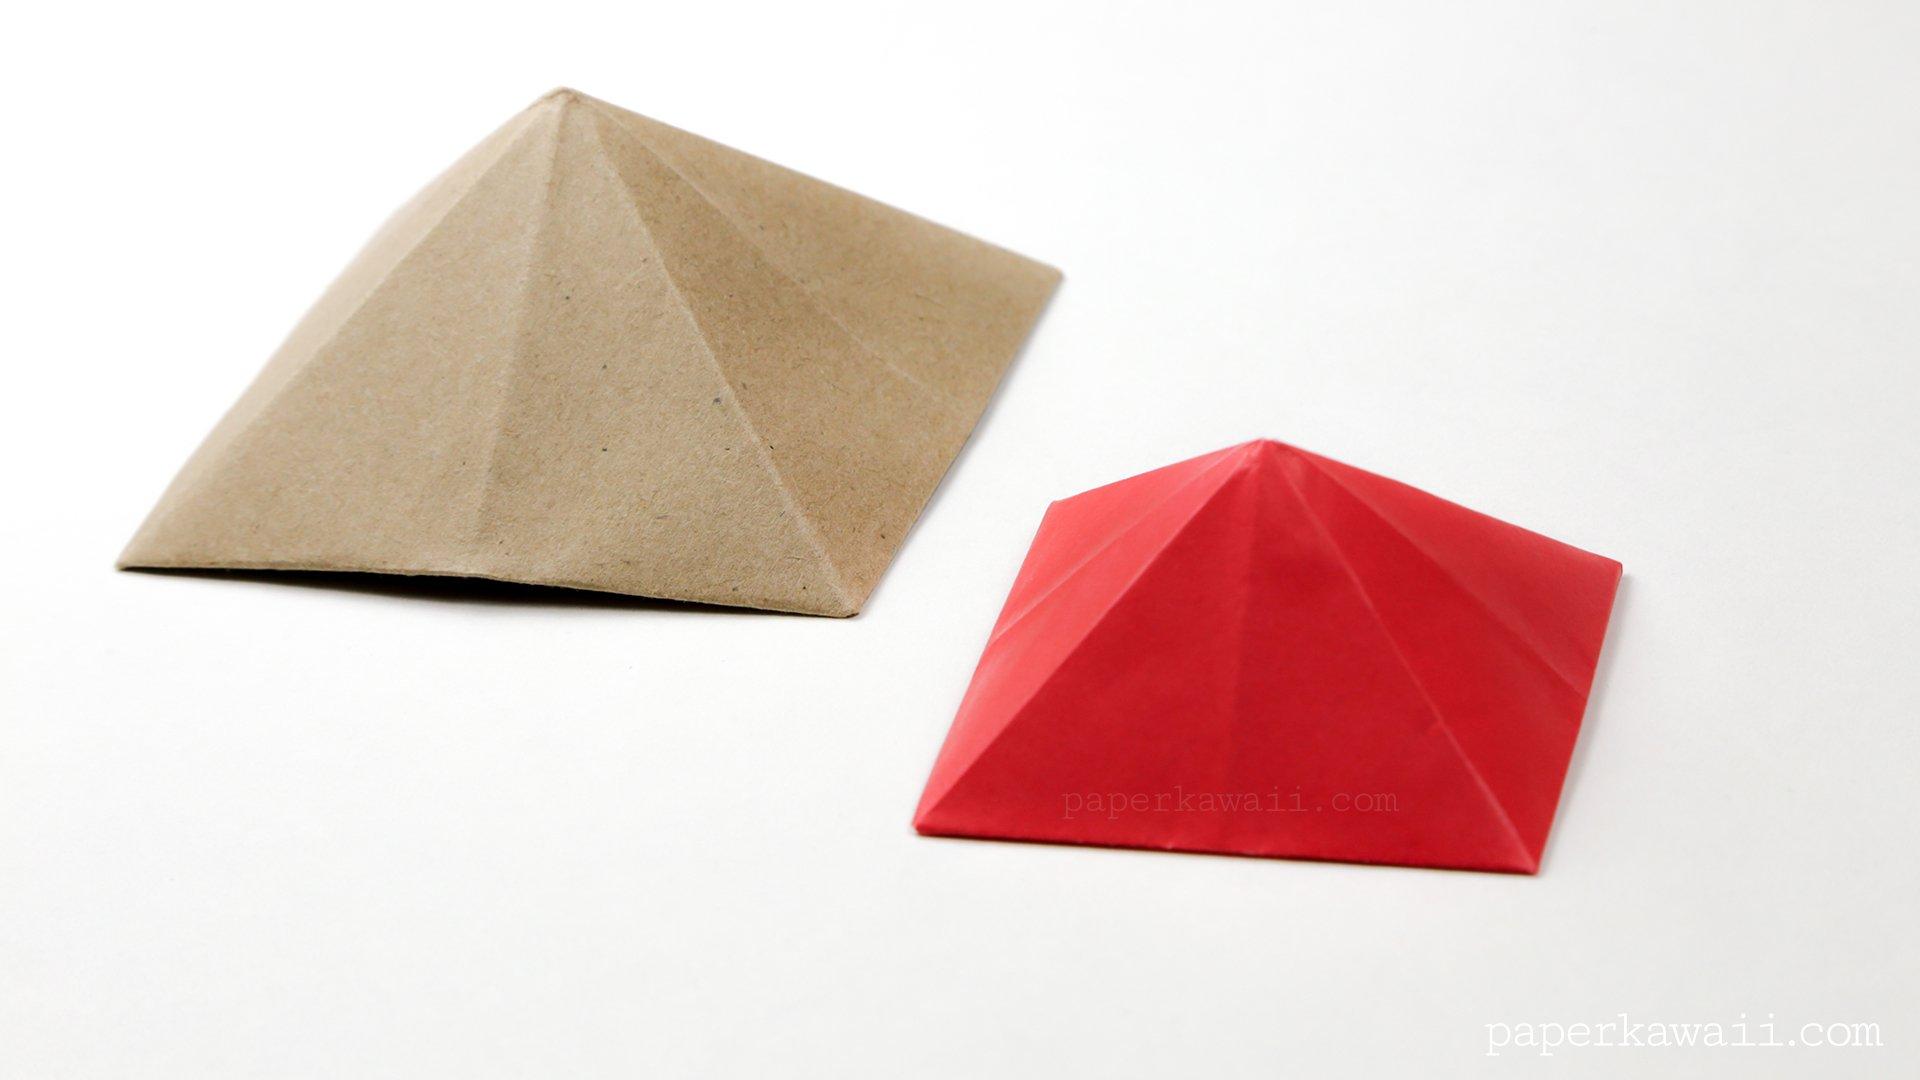 origami square pyramid house lid paper kawaii